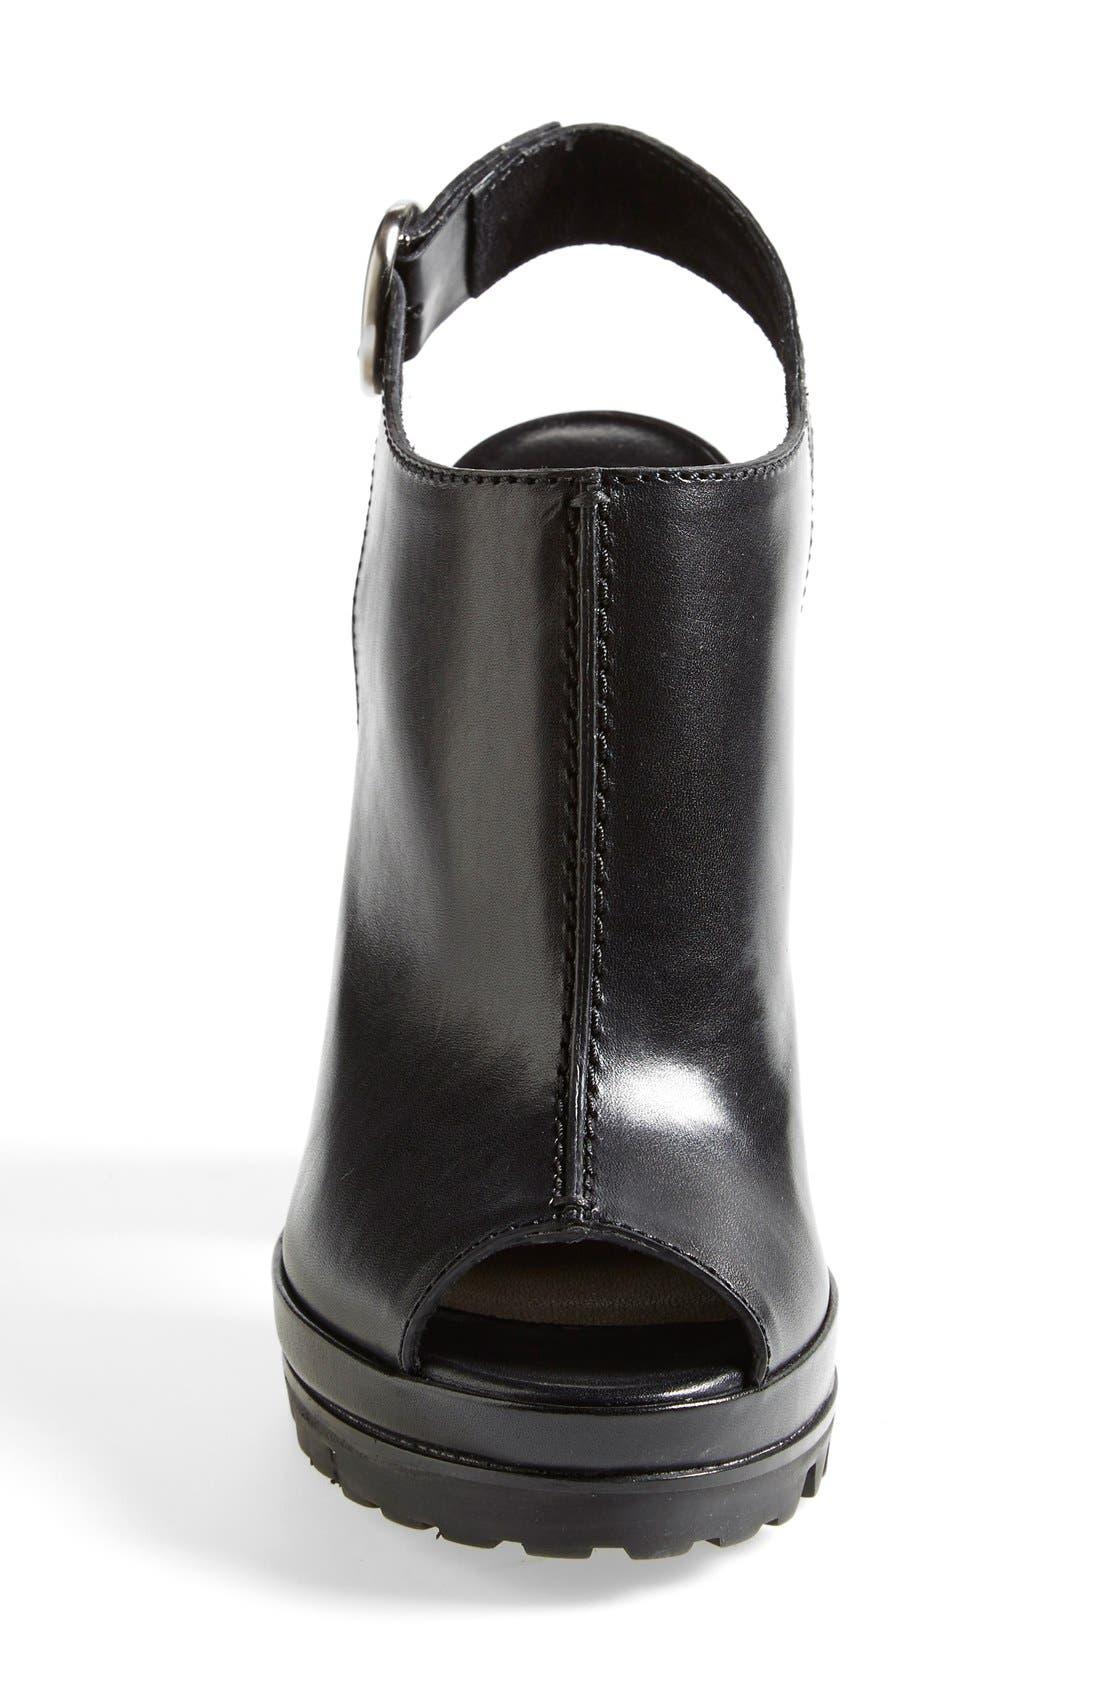 Alternate Image 3  - Michael Kors 'Patras' Sandal (Women)